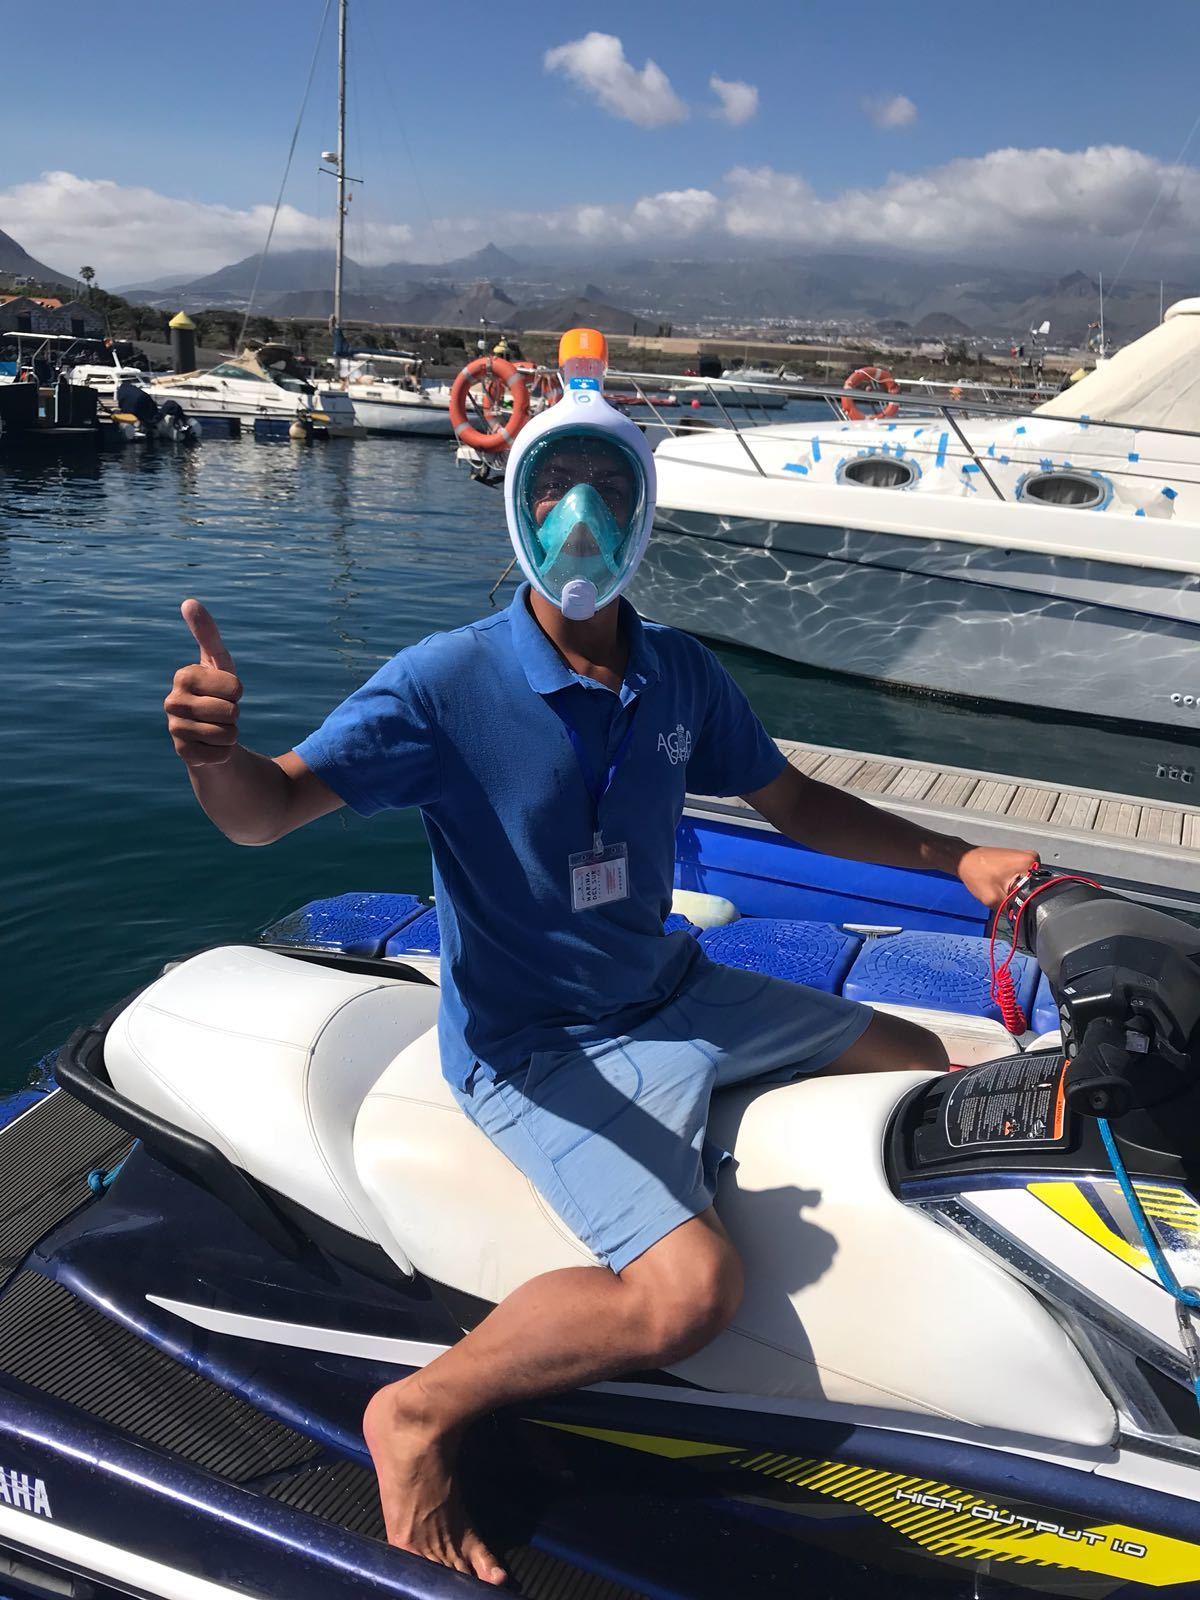 jet ski, tenerife, safari, jetski, las americas, jet bike, dolphins, ocean, cave, snorkeling